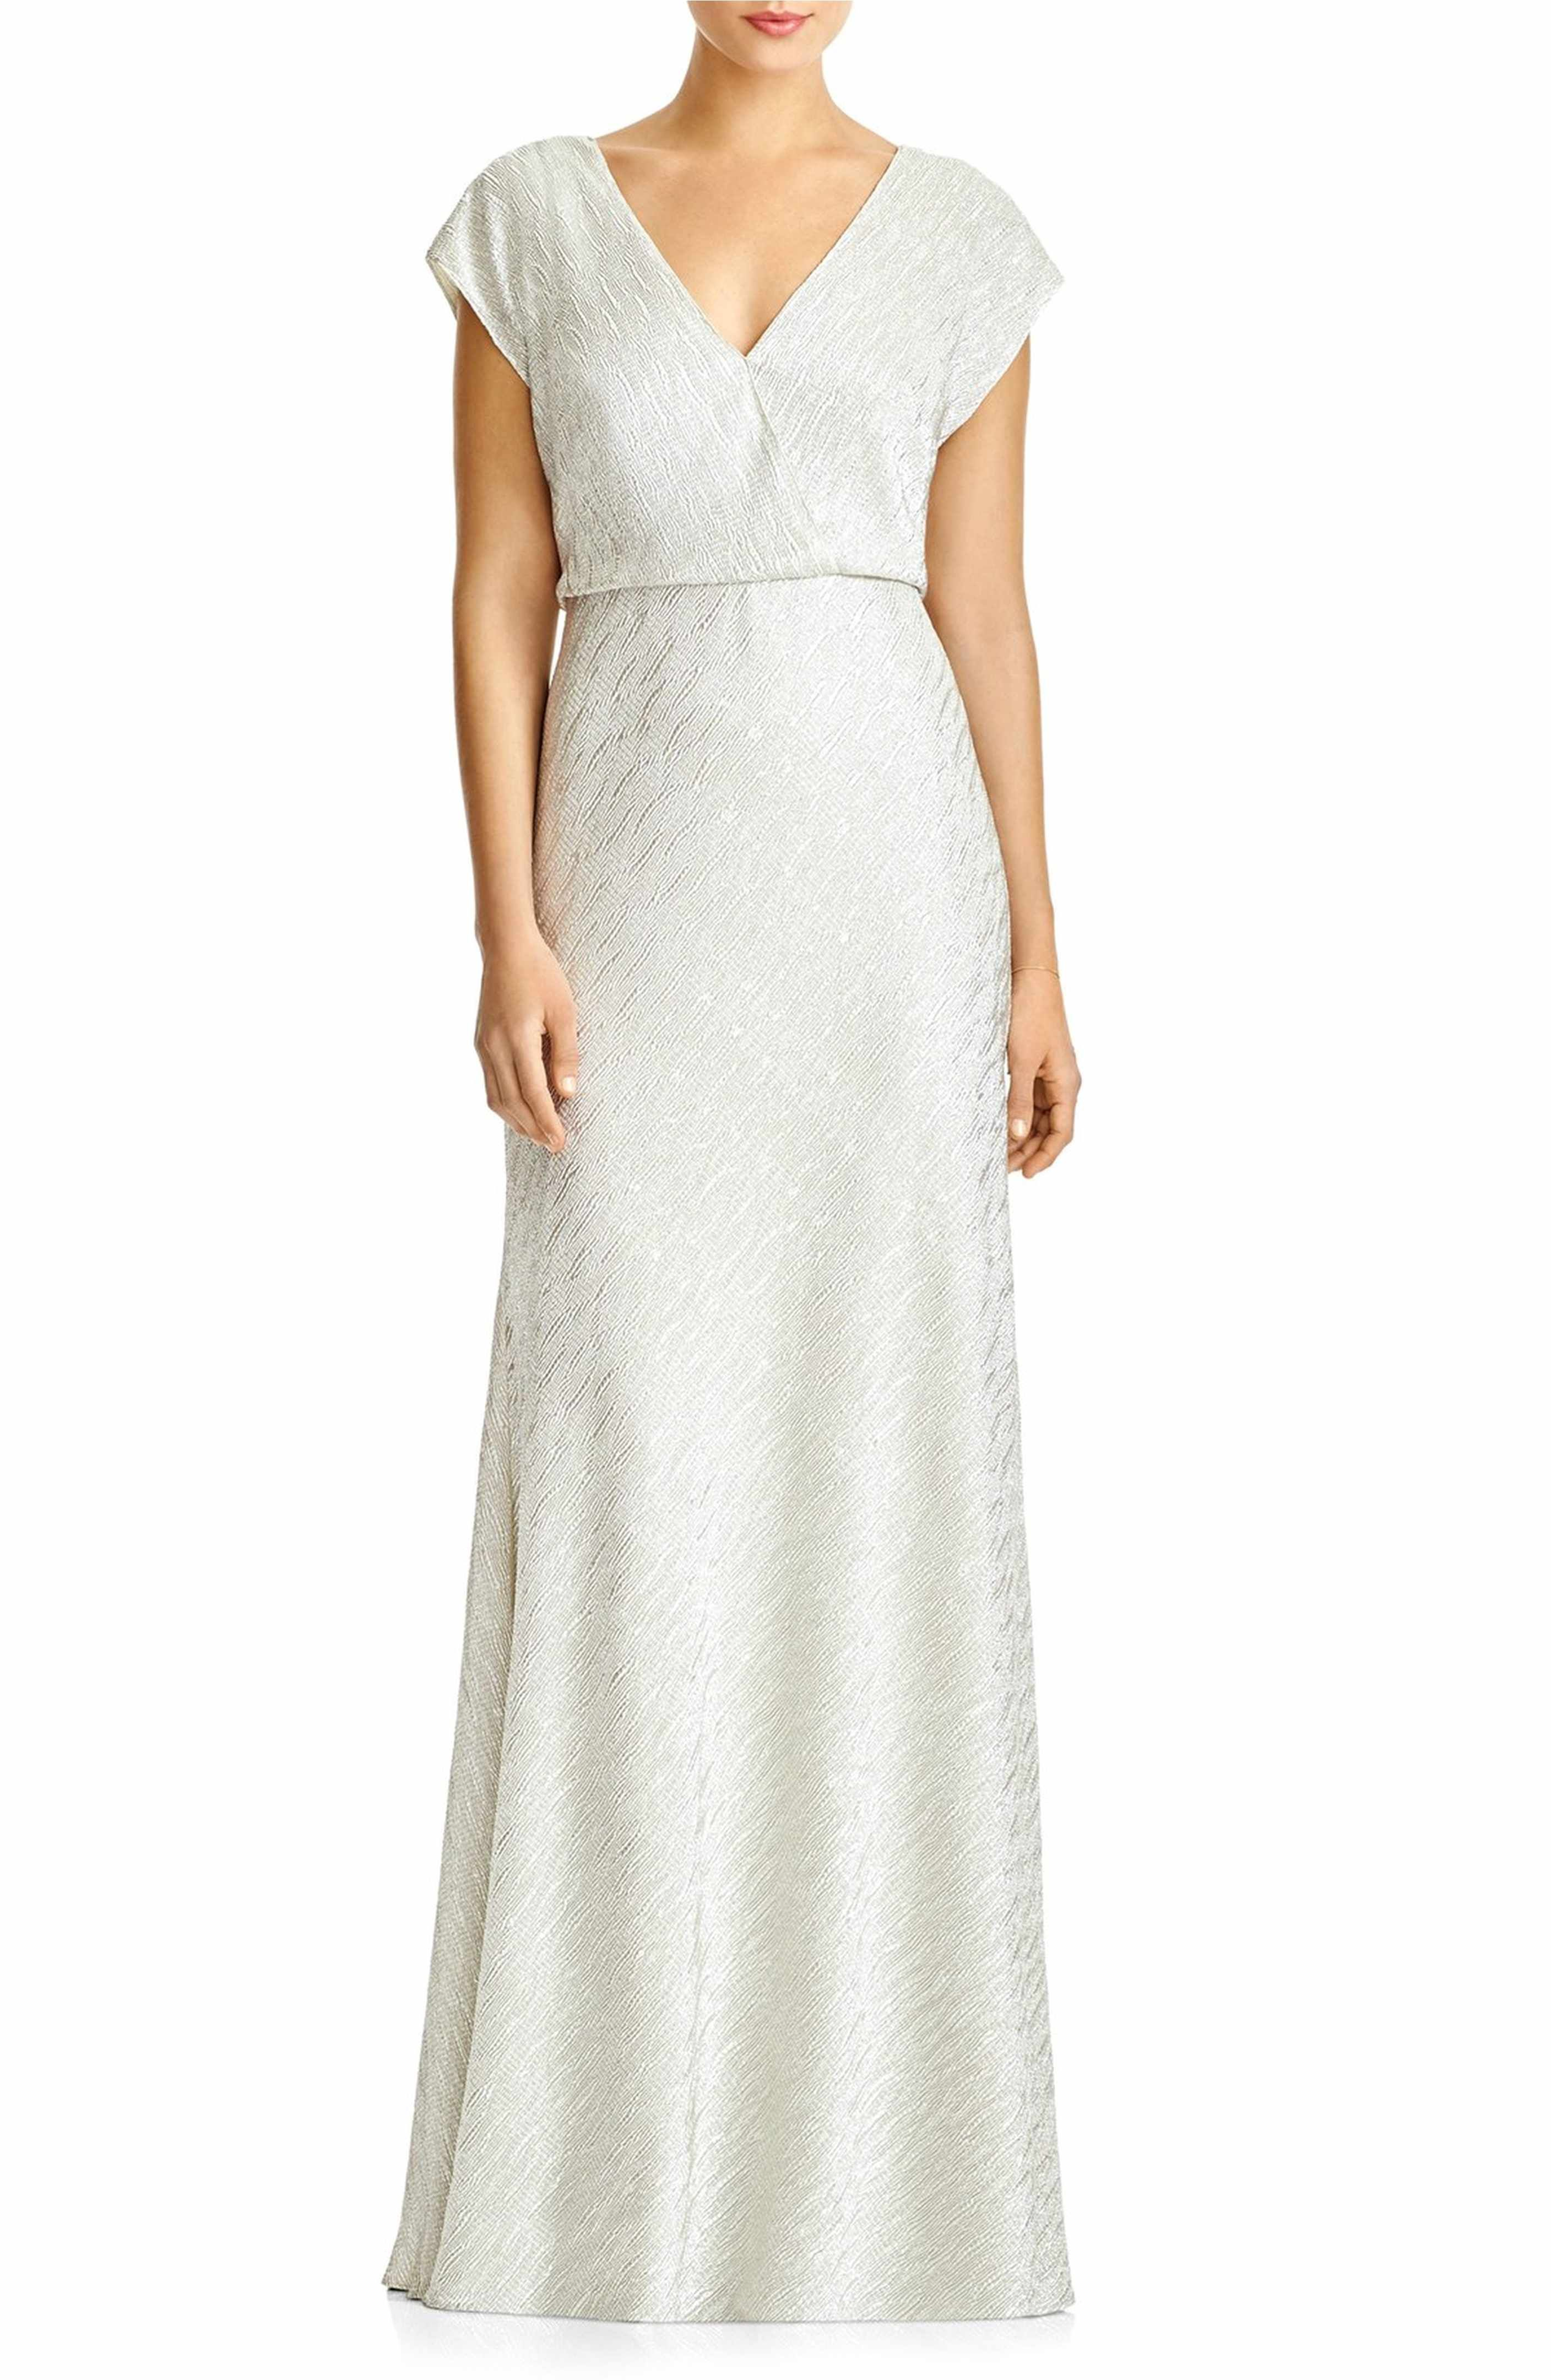 Metallic wedding dress  Main Image  JY Jenny Yoo uSohou Metallic Blouson VNeck Gown